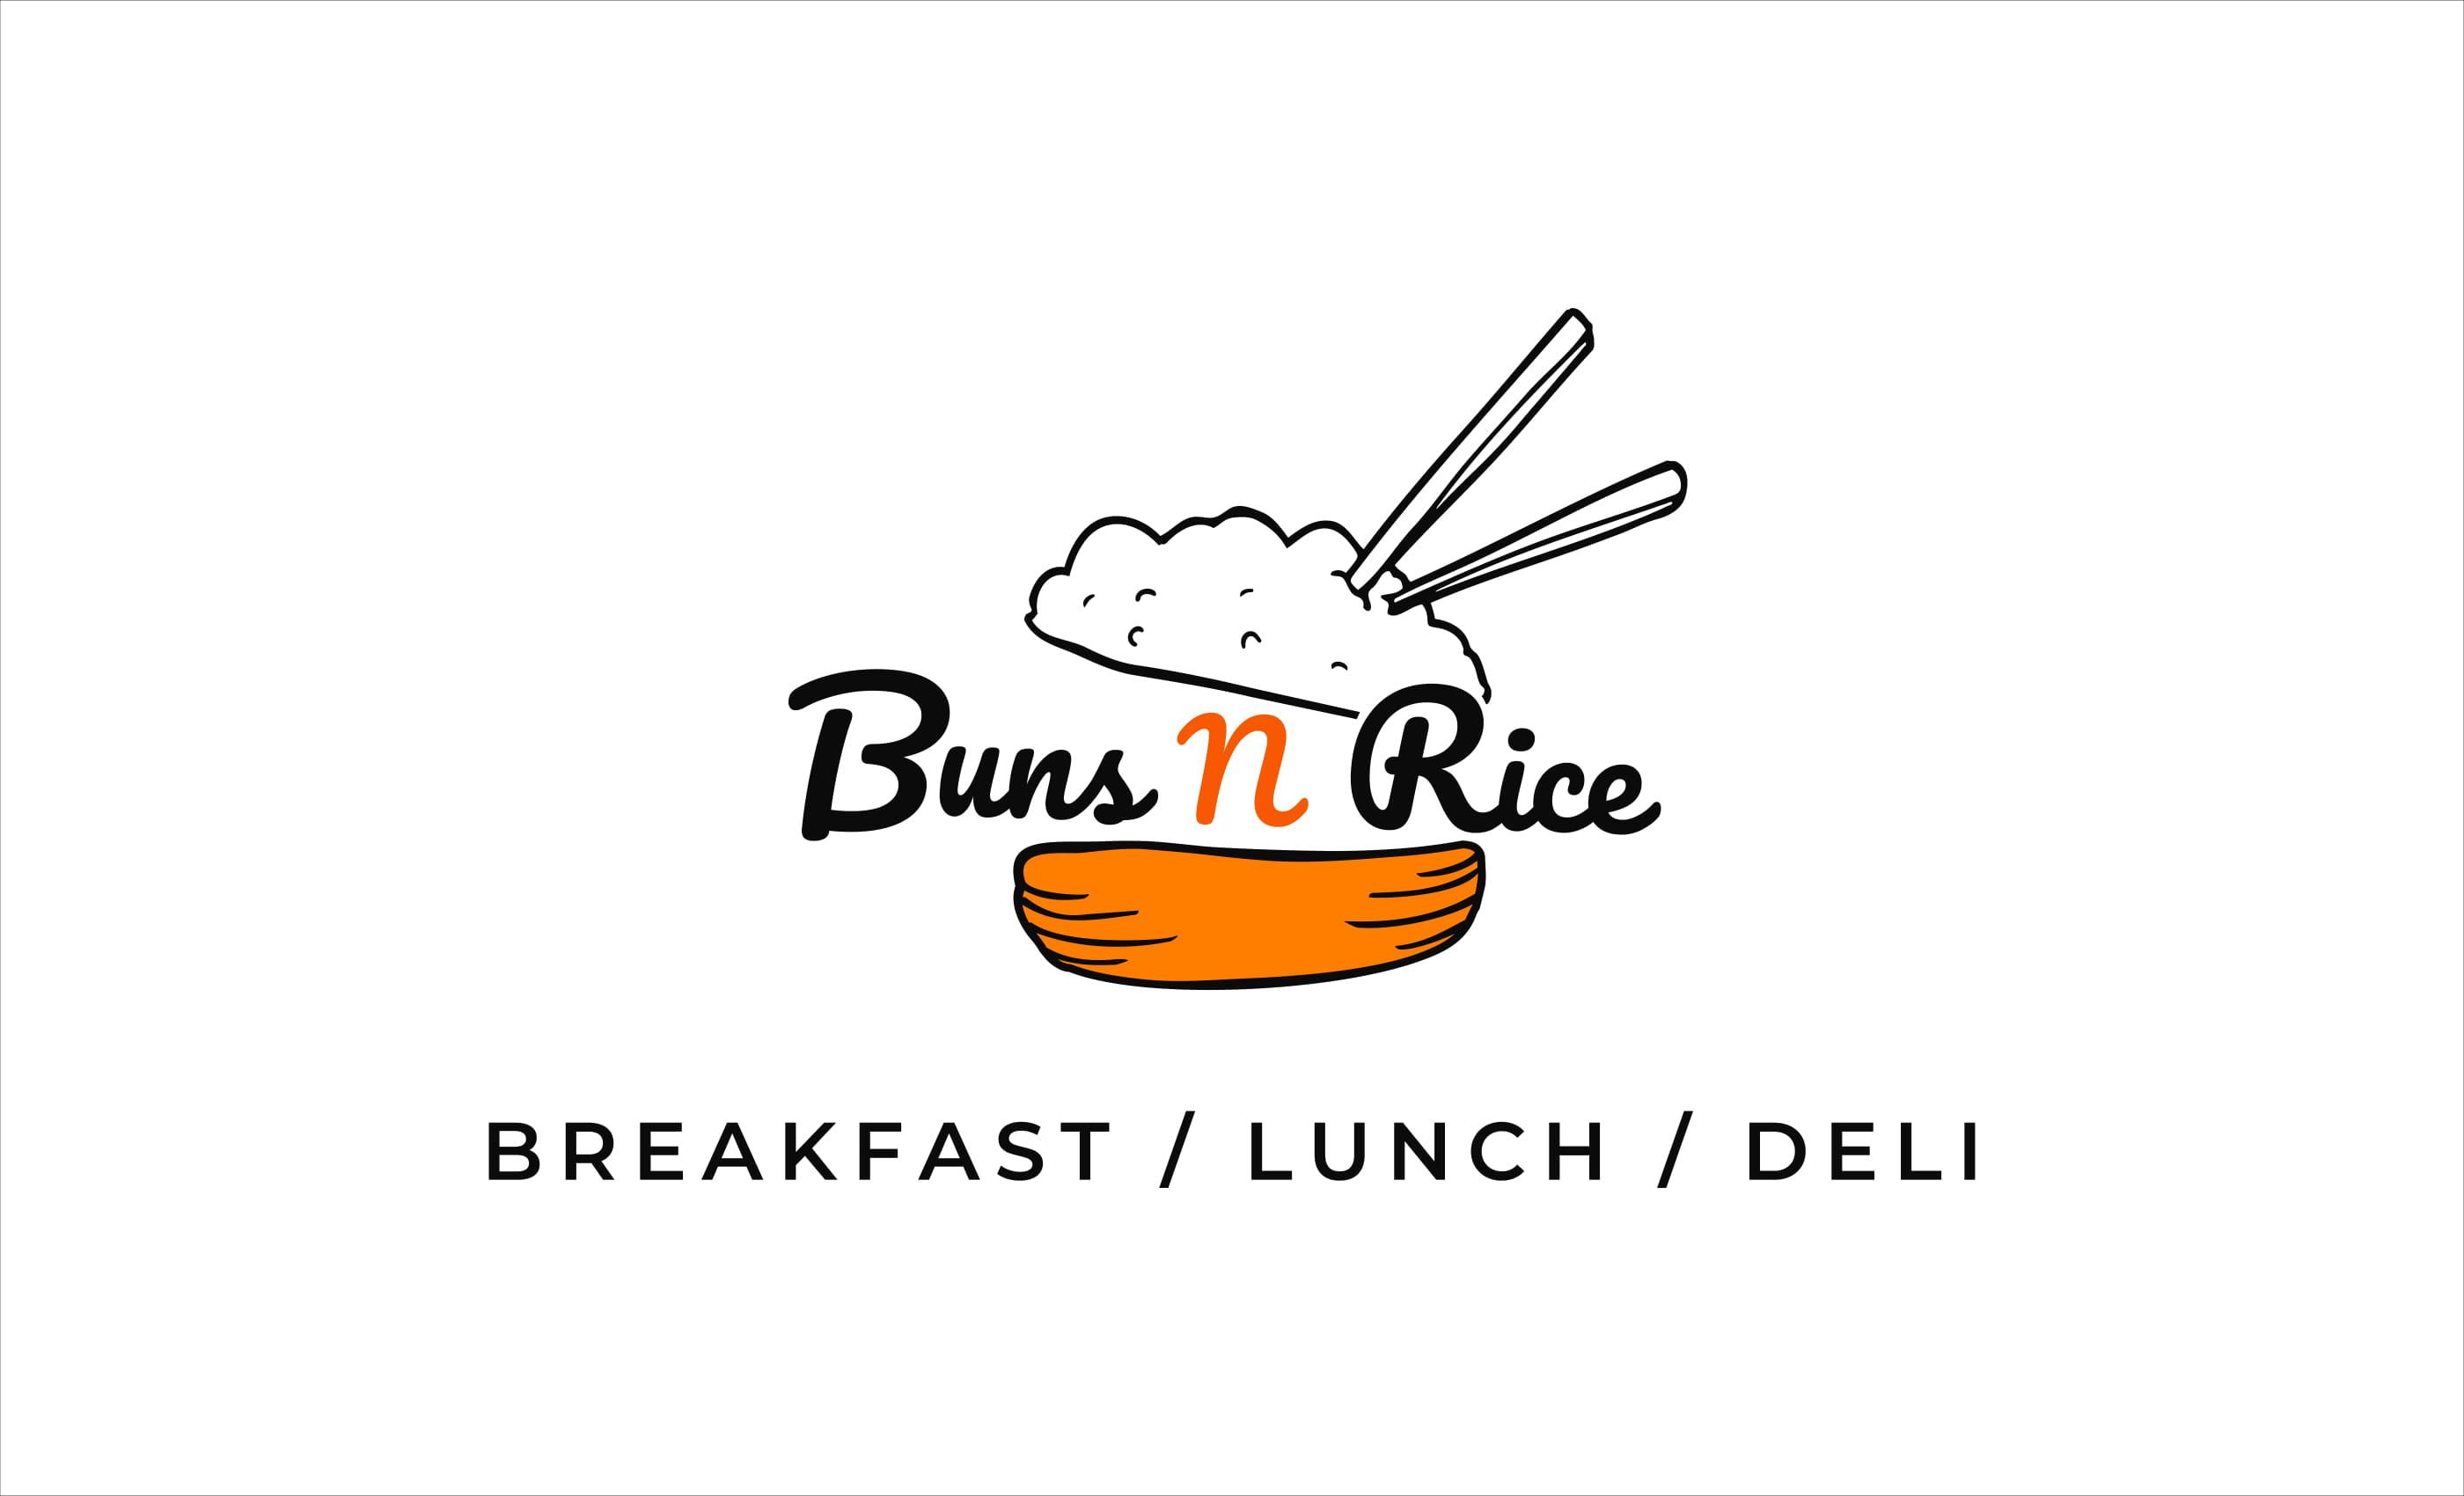 Buns N Rice